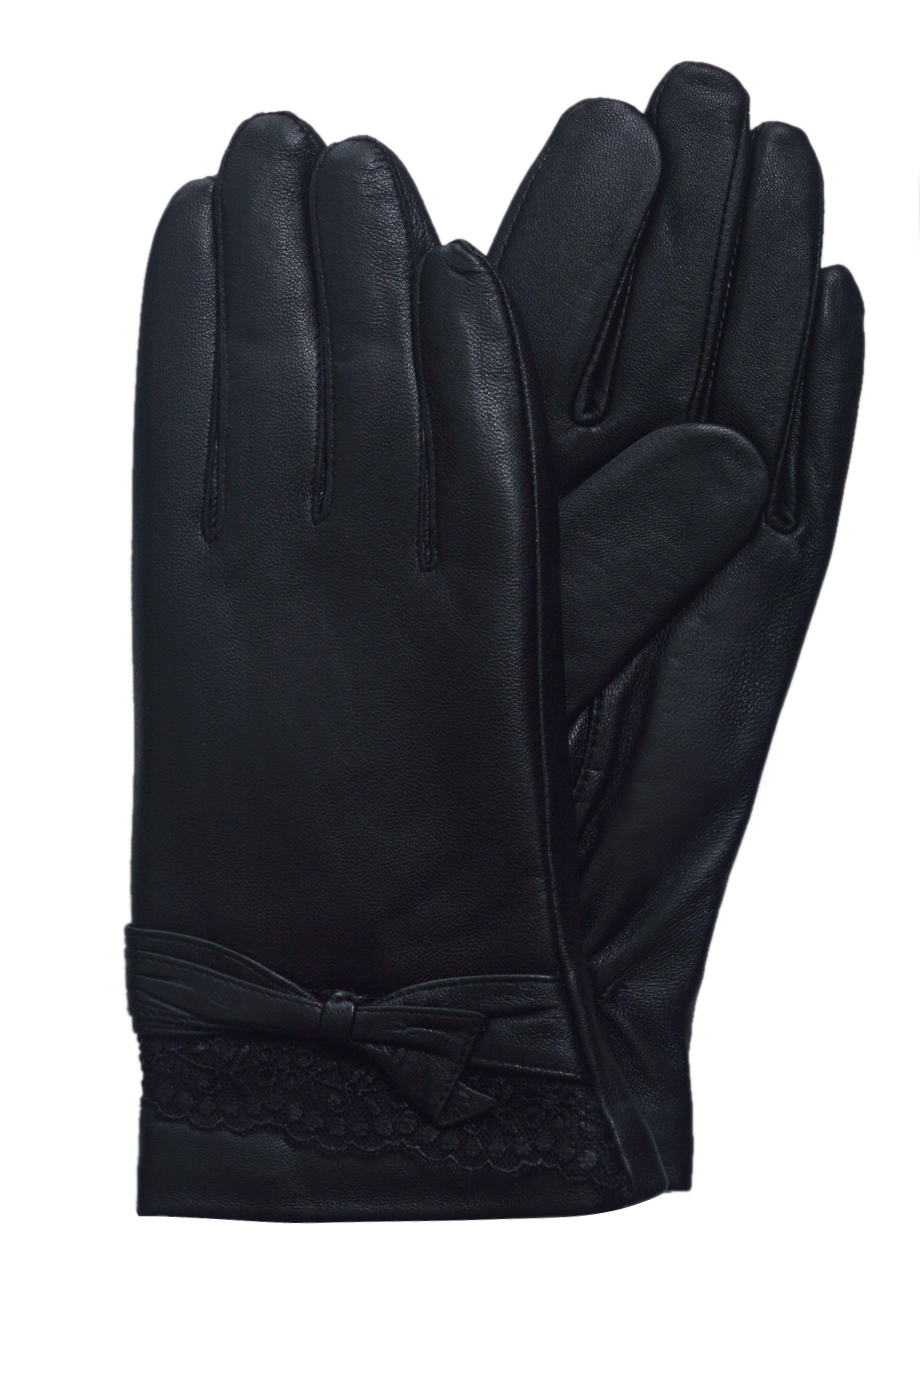 Găng tay nữ ELMI da dê cao cấp EGW136